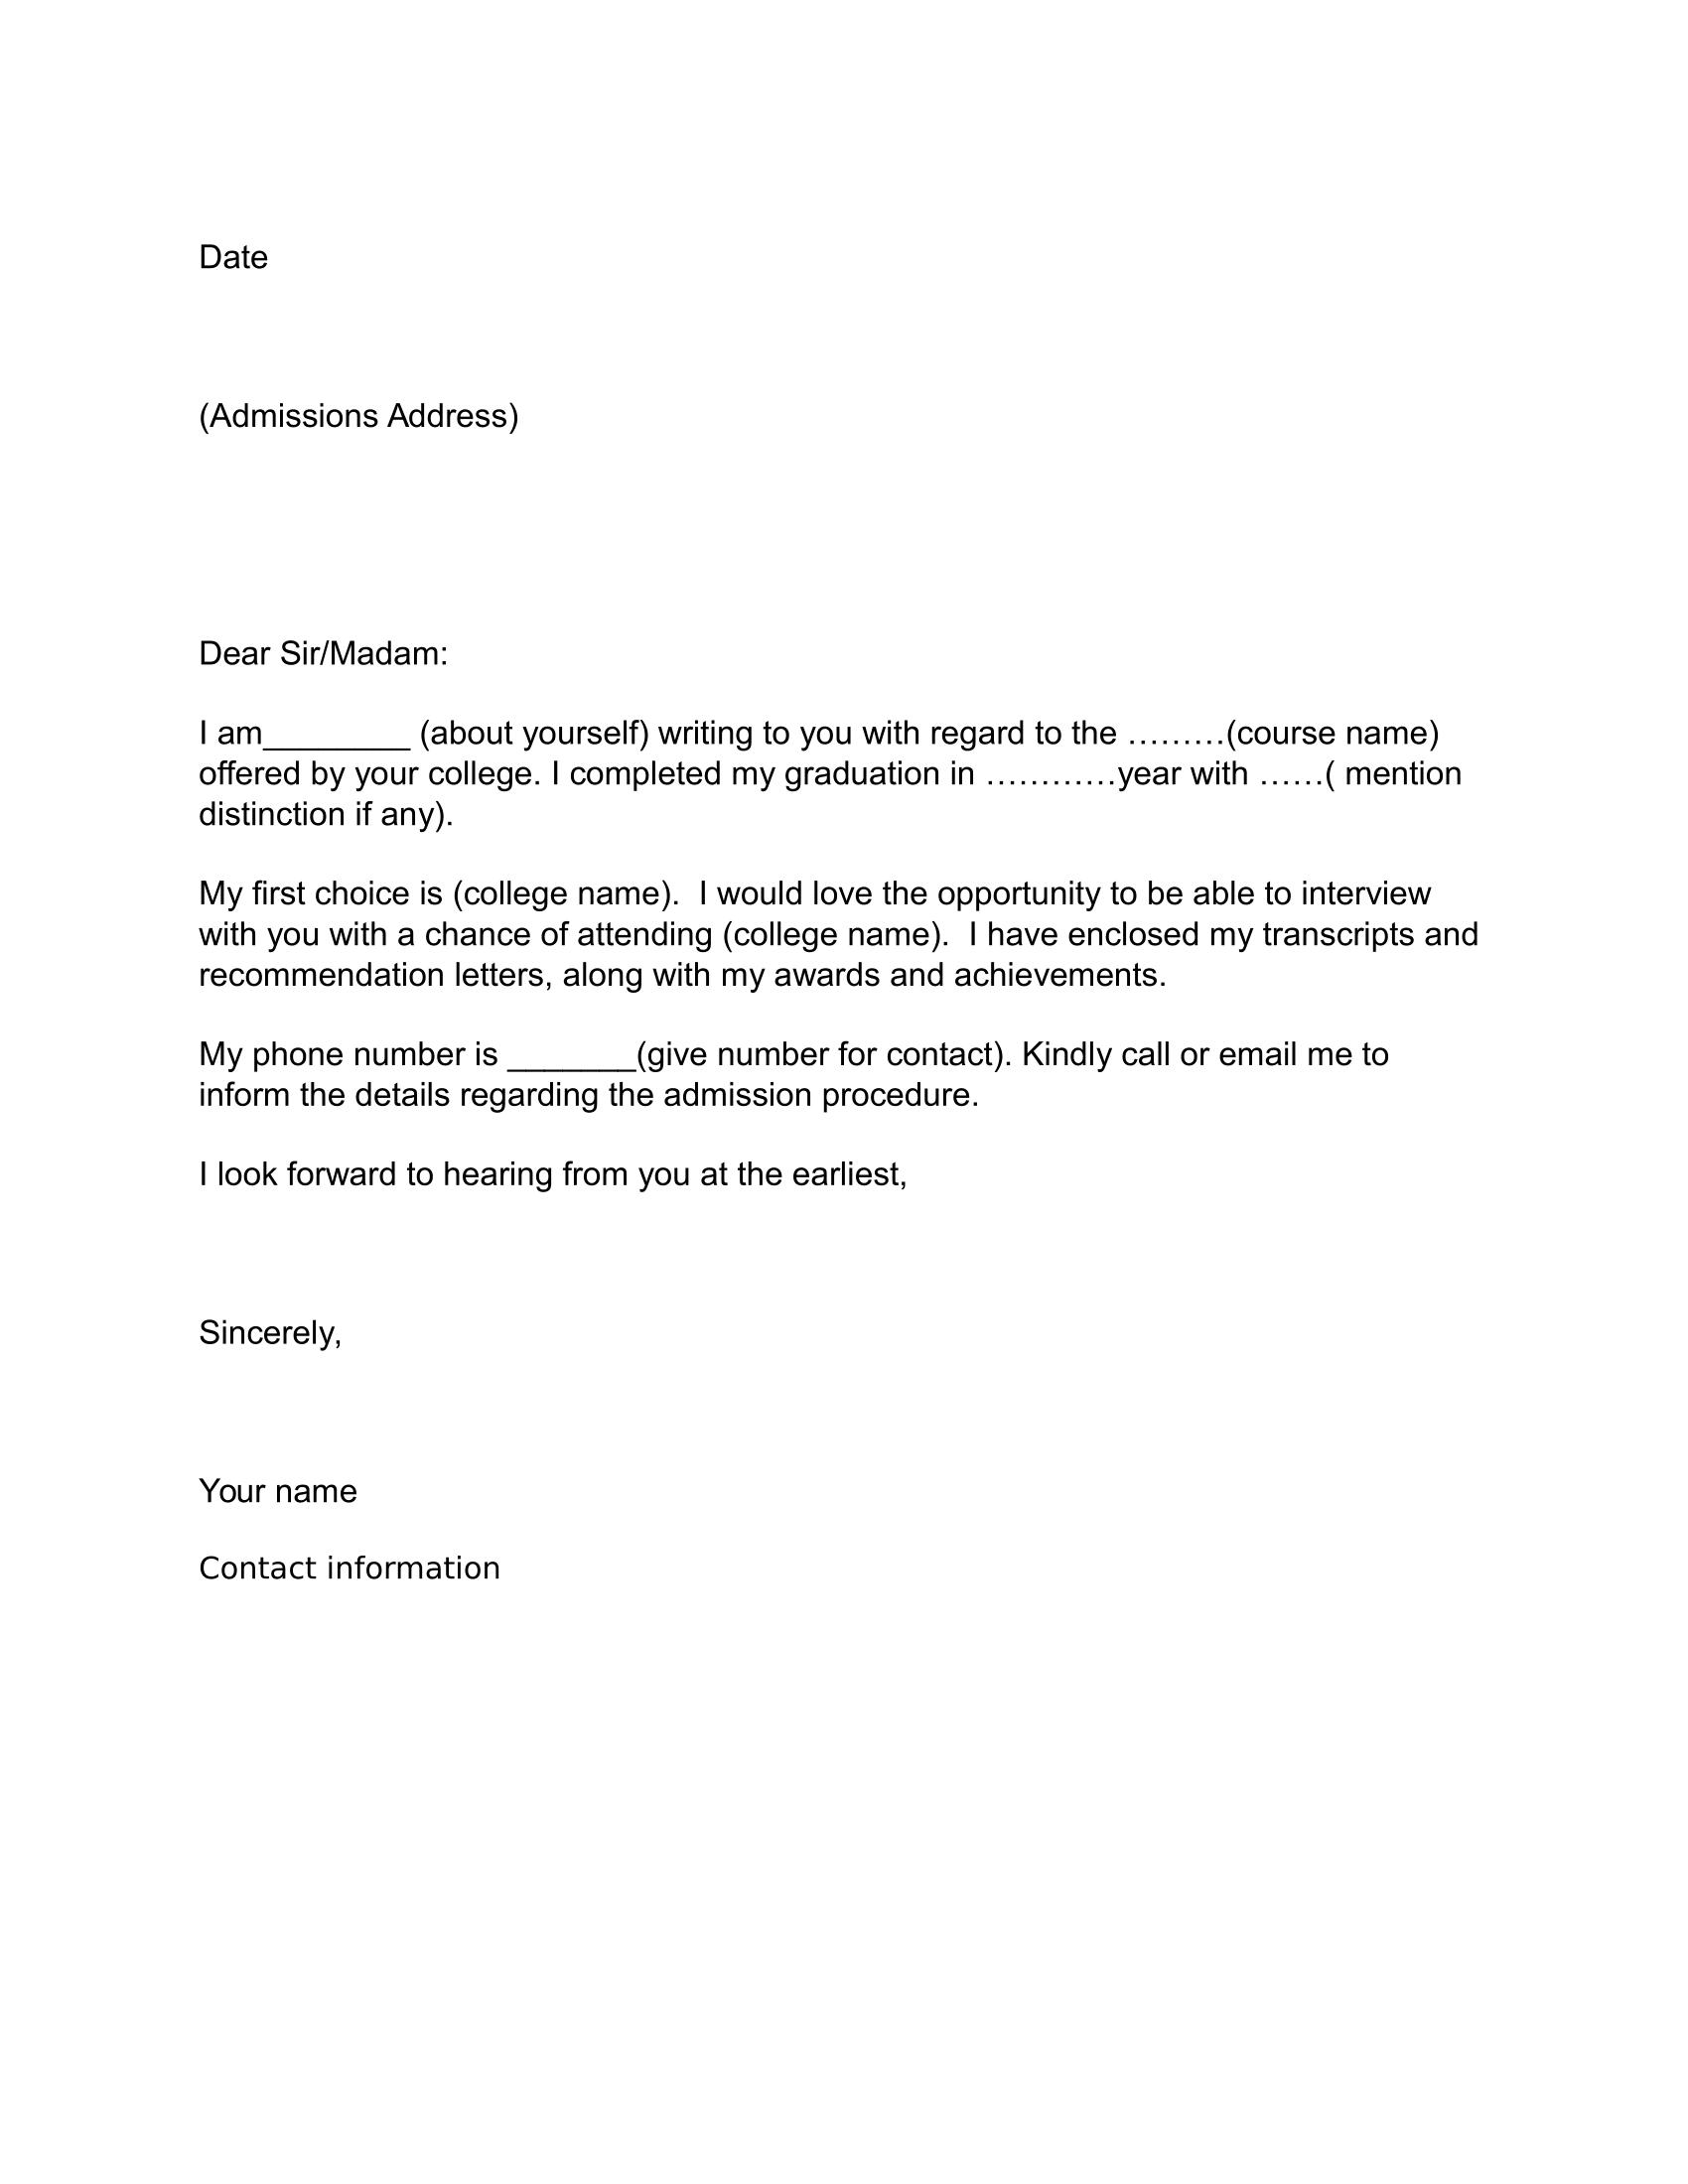 Job Application Letter Sample - Download Free Business Letter - Free Printable Cover Letter Format